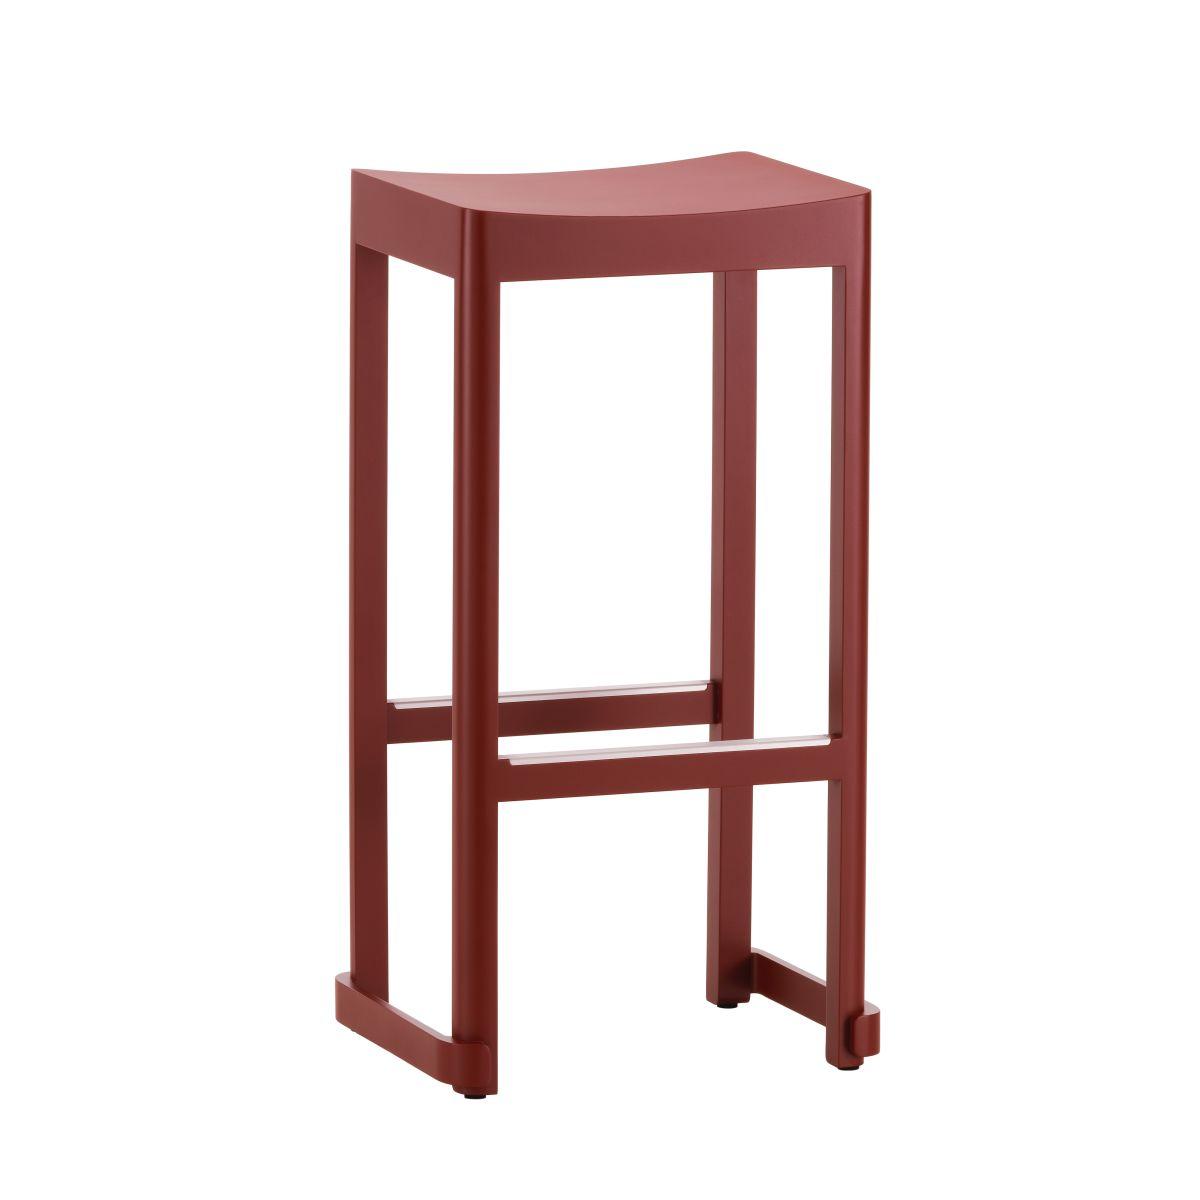 Atelier-Bar-Stool-75-cm-beech-dark-red_F-4741554